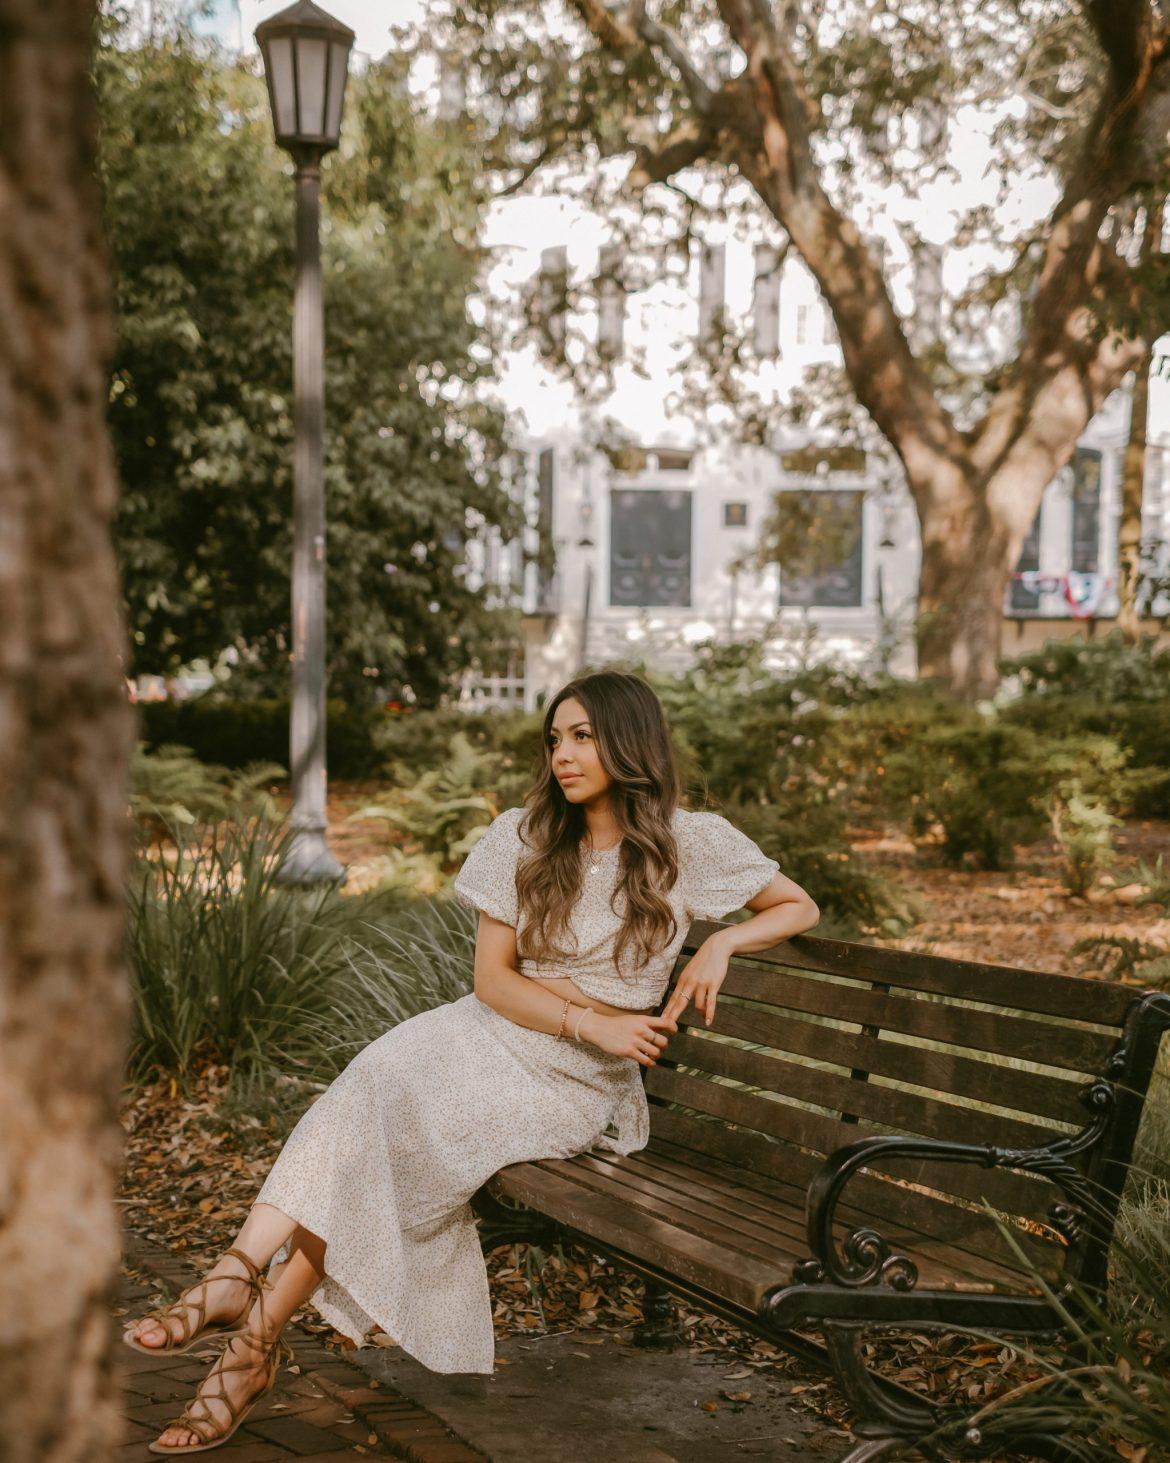 Forrest Gump bench in Savannah, Georgia   The Ultimate Savannah Travel Guide